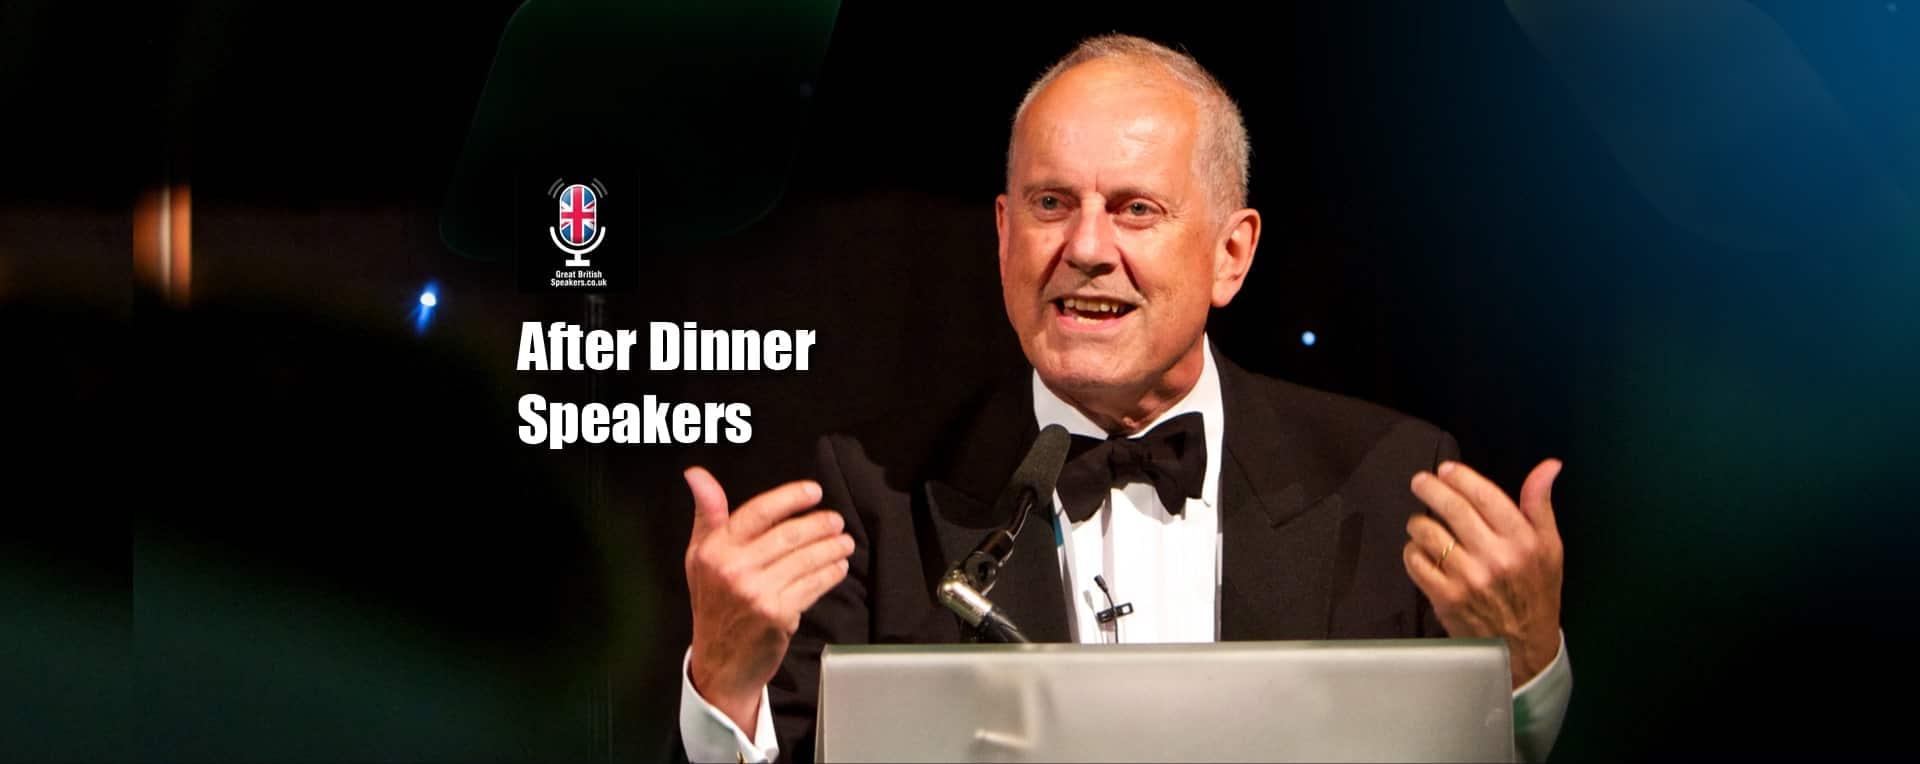 After Dinner Speakers Slider Great British Speakers-min